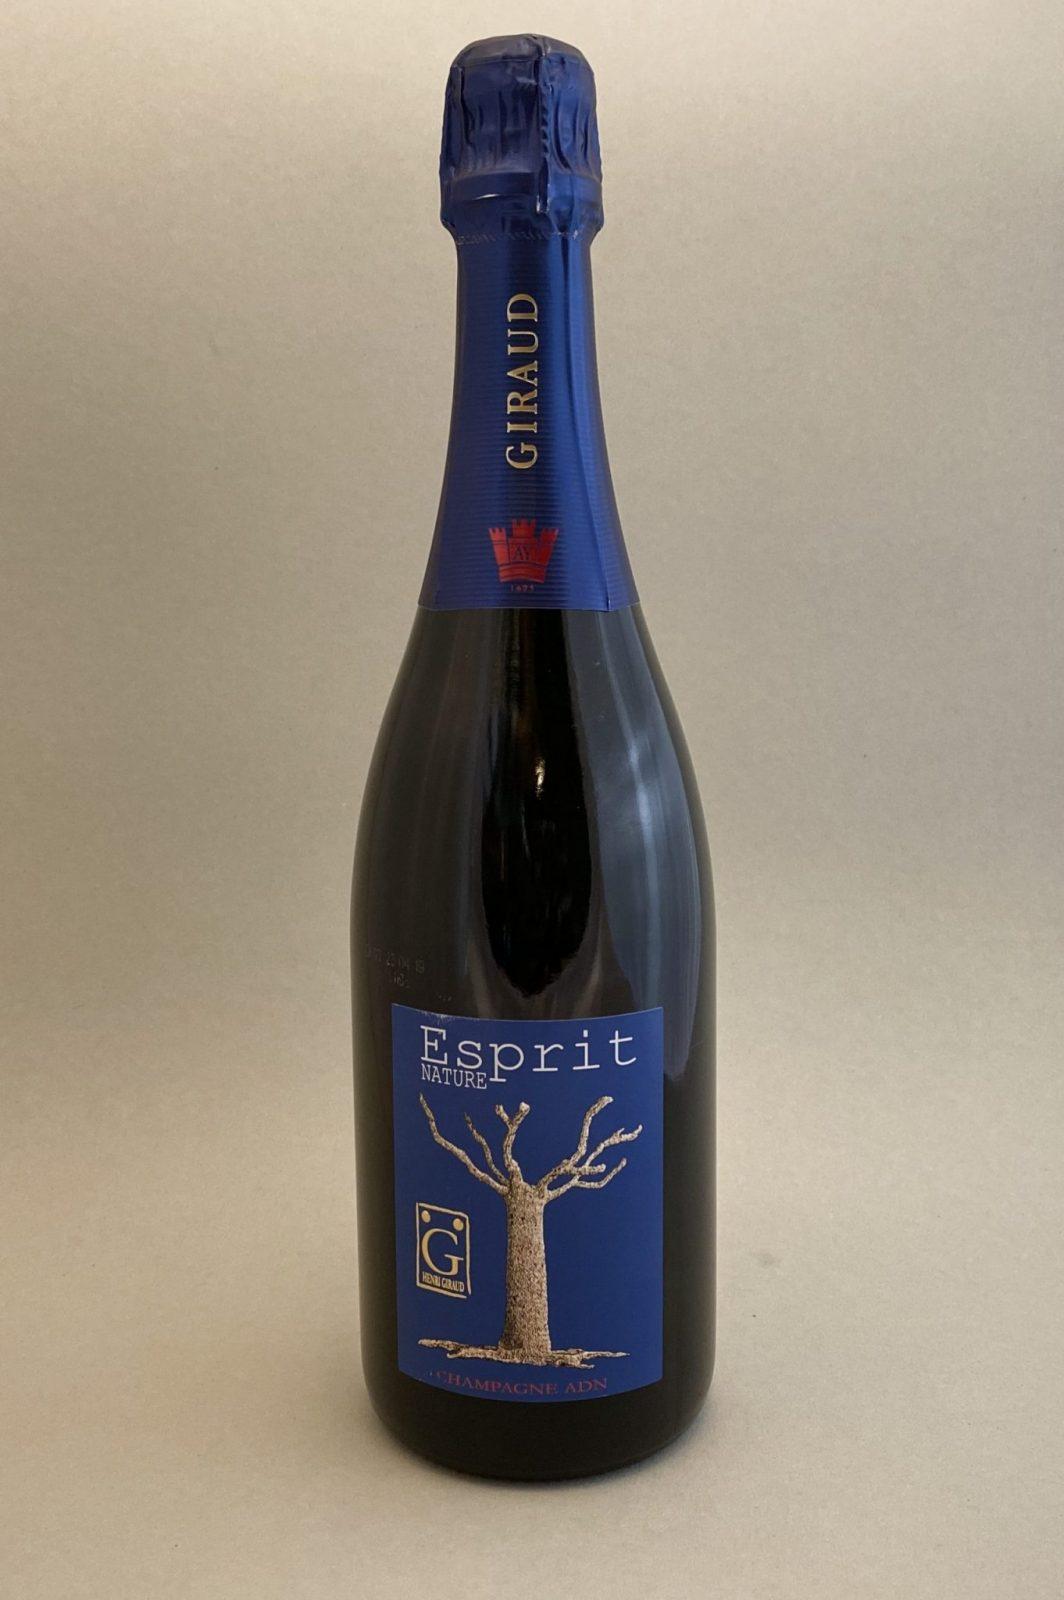 HENRI GIRAUD Esprit Champagne Brut Nature, Bulbinkove vino, vinotéka Bratislava Slnecnice, Sunnywines, rozvoz vina, winebar